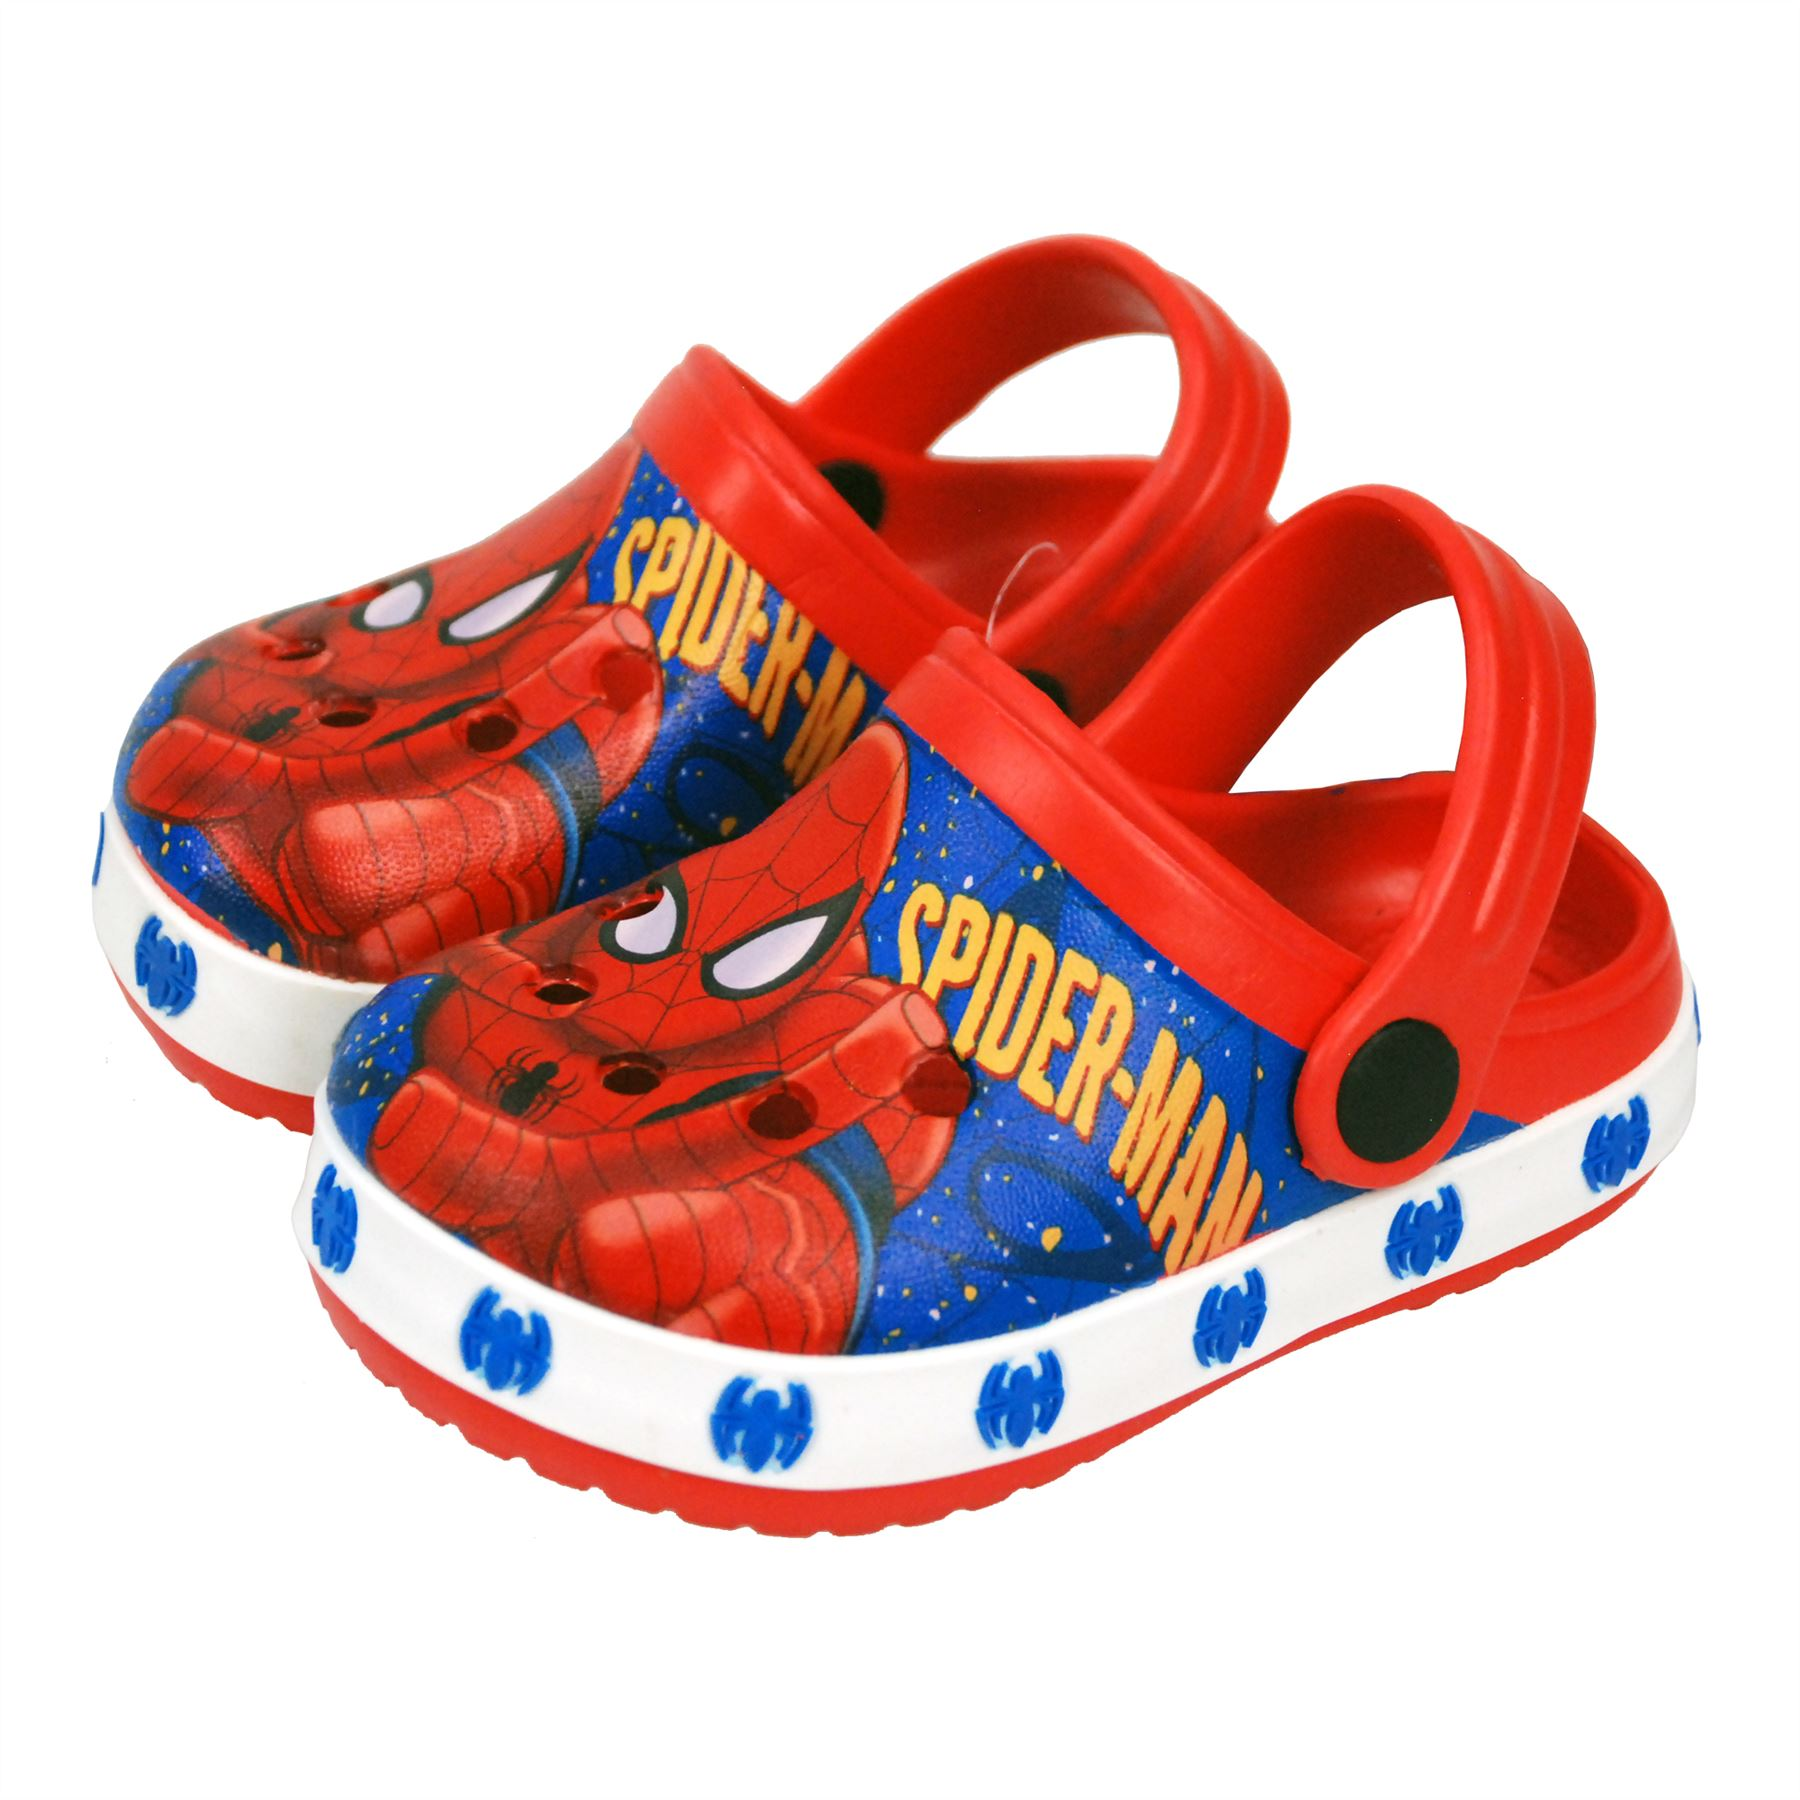 Marvel® SpiderMan Boys Sandals Crocs Pool Beach Shoes UK Sizes 18mths - 9years